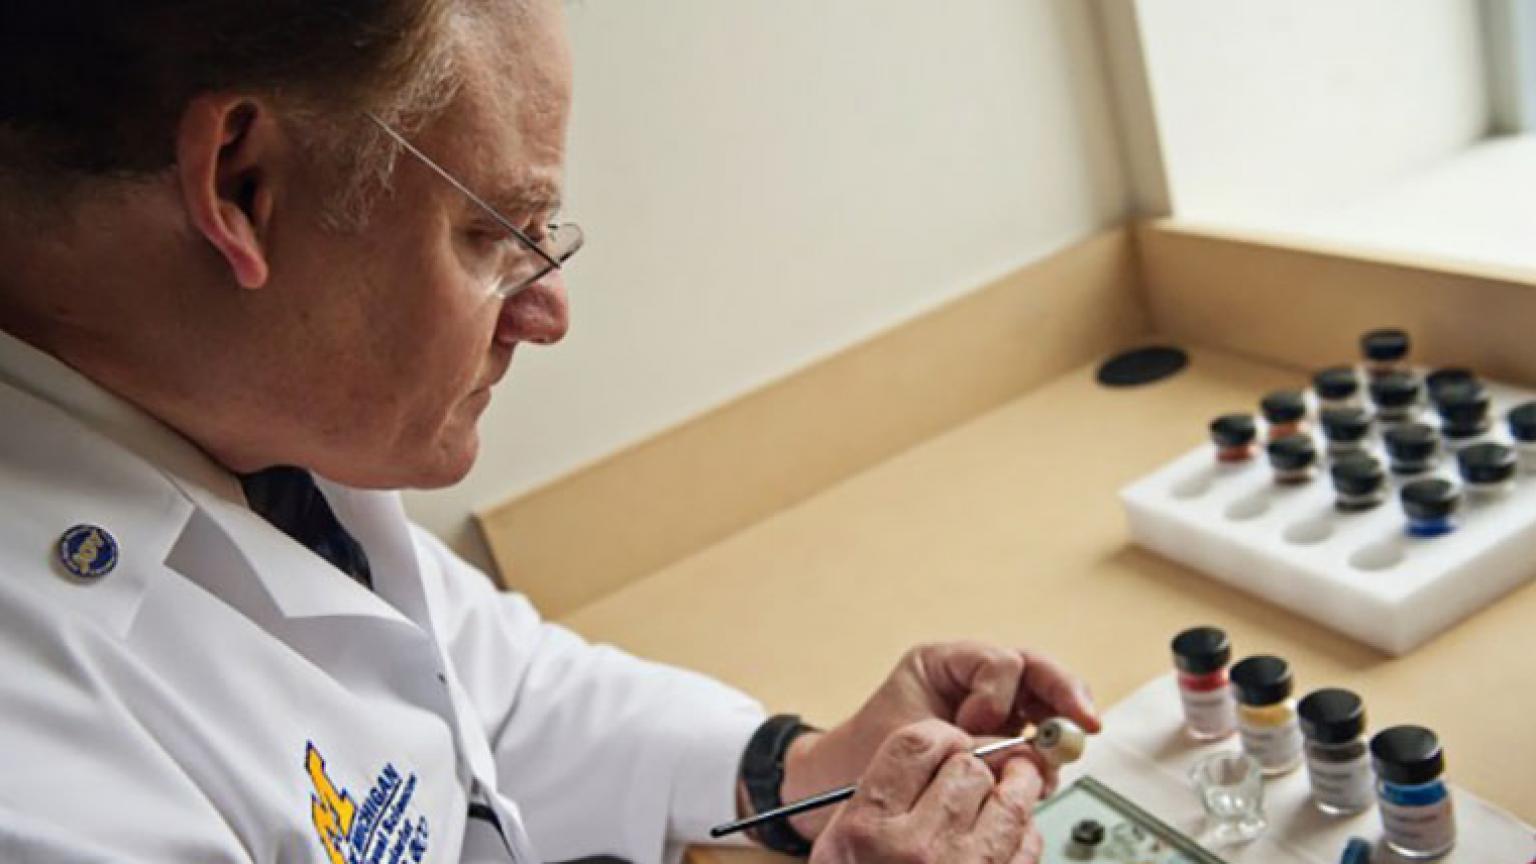 Ocularist Greg Dootz crafting an prosthetic eye